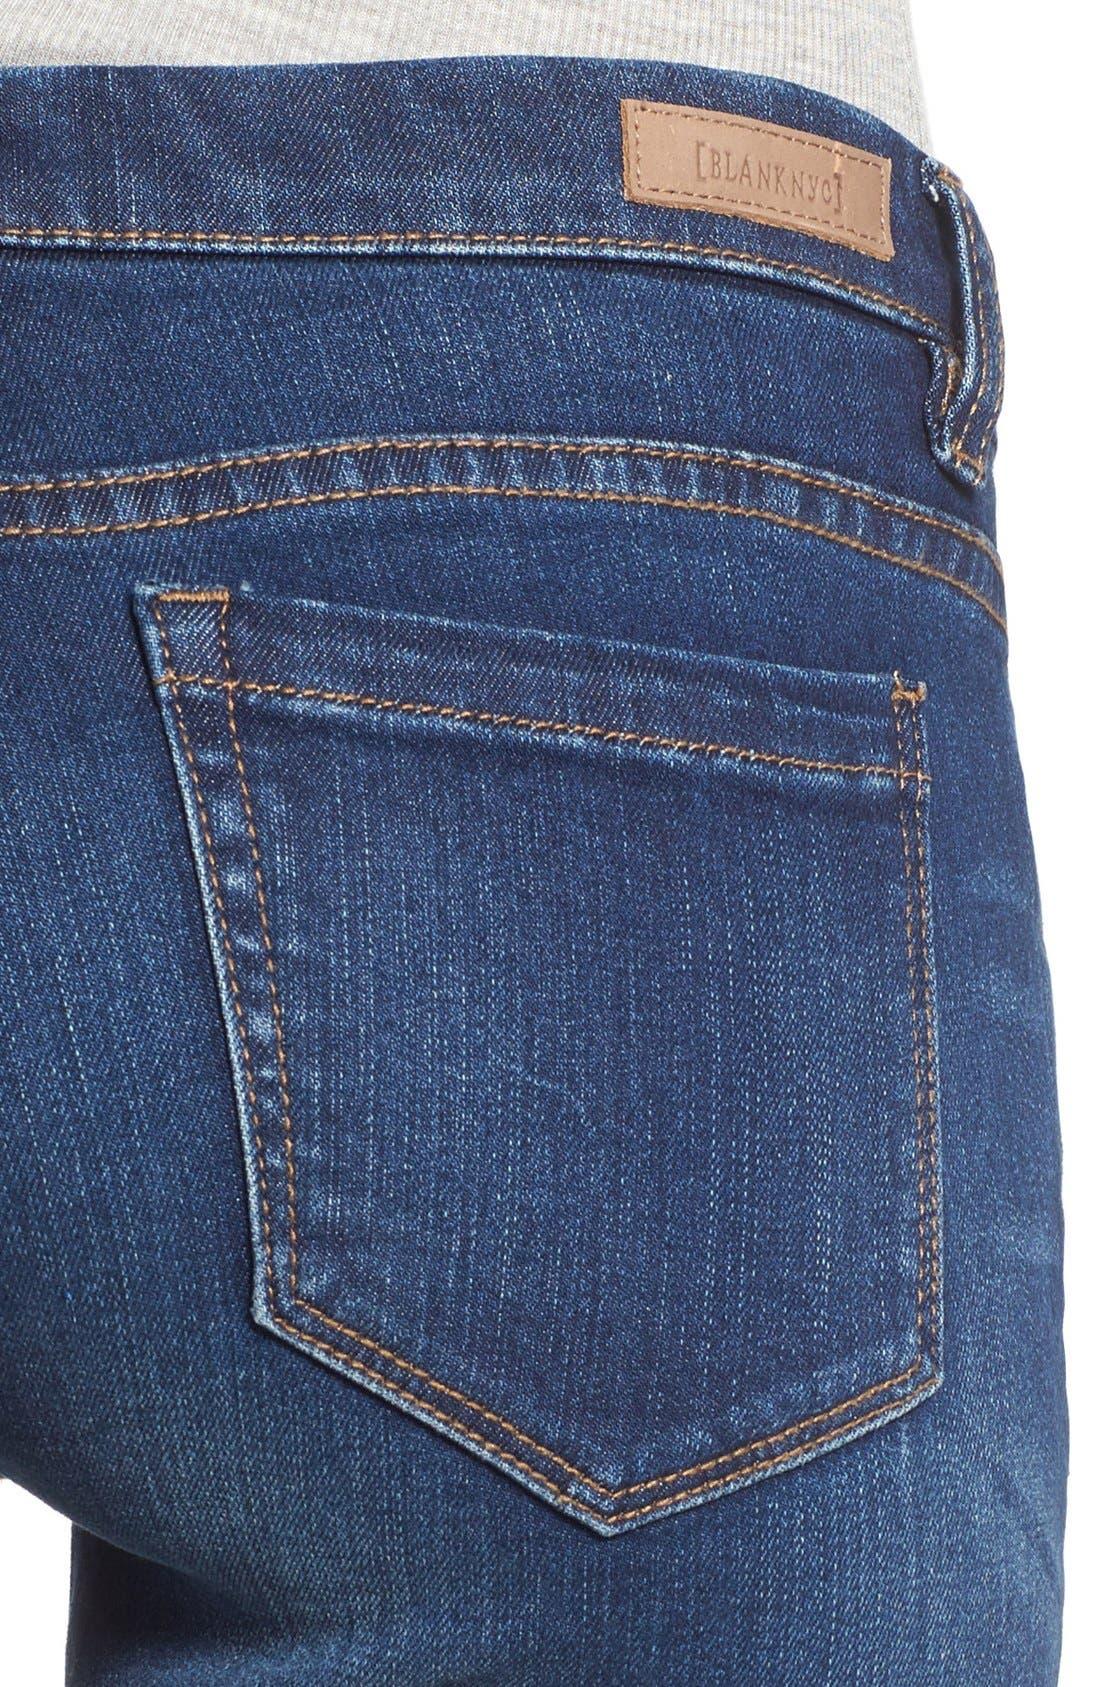 Alternate Image 4  - BLANKNYC 'Buffering' Skinny Jeans (Call it Karma)